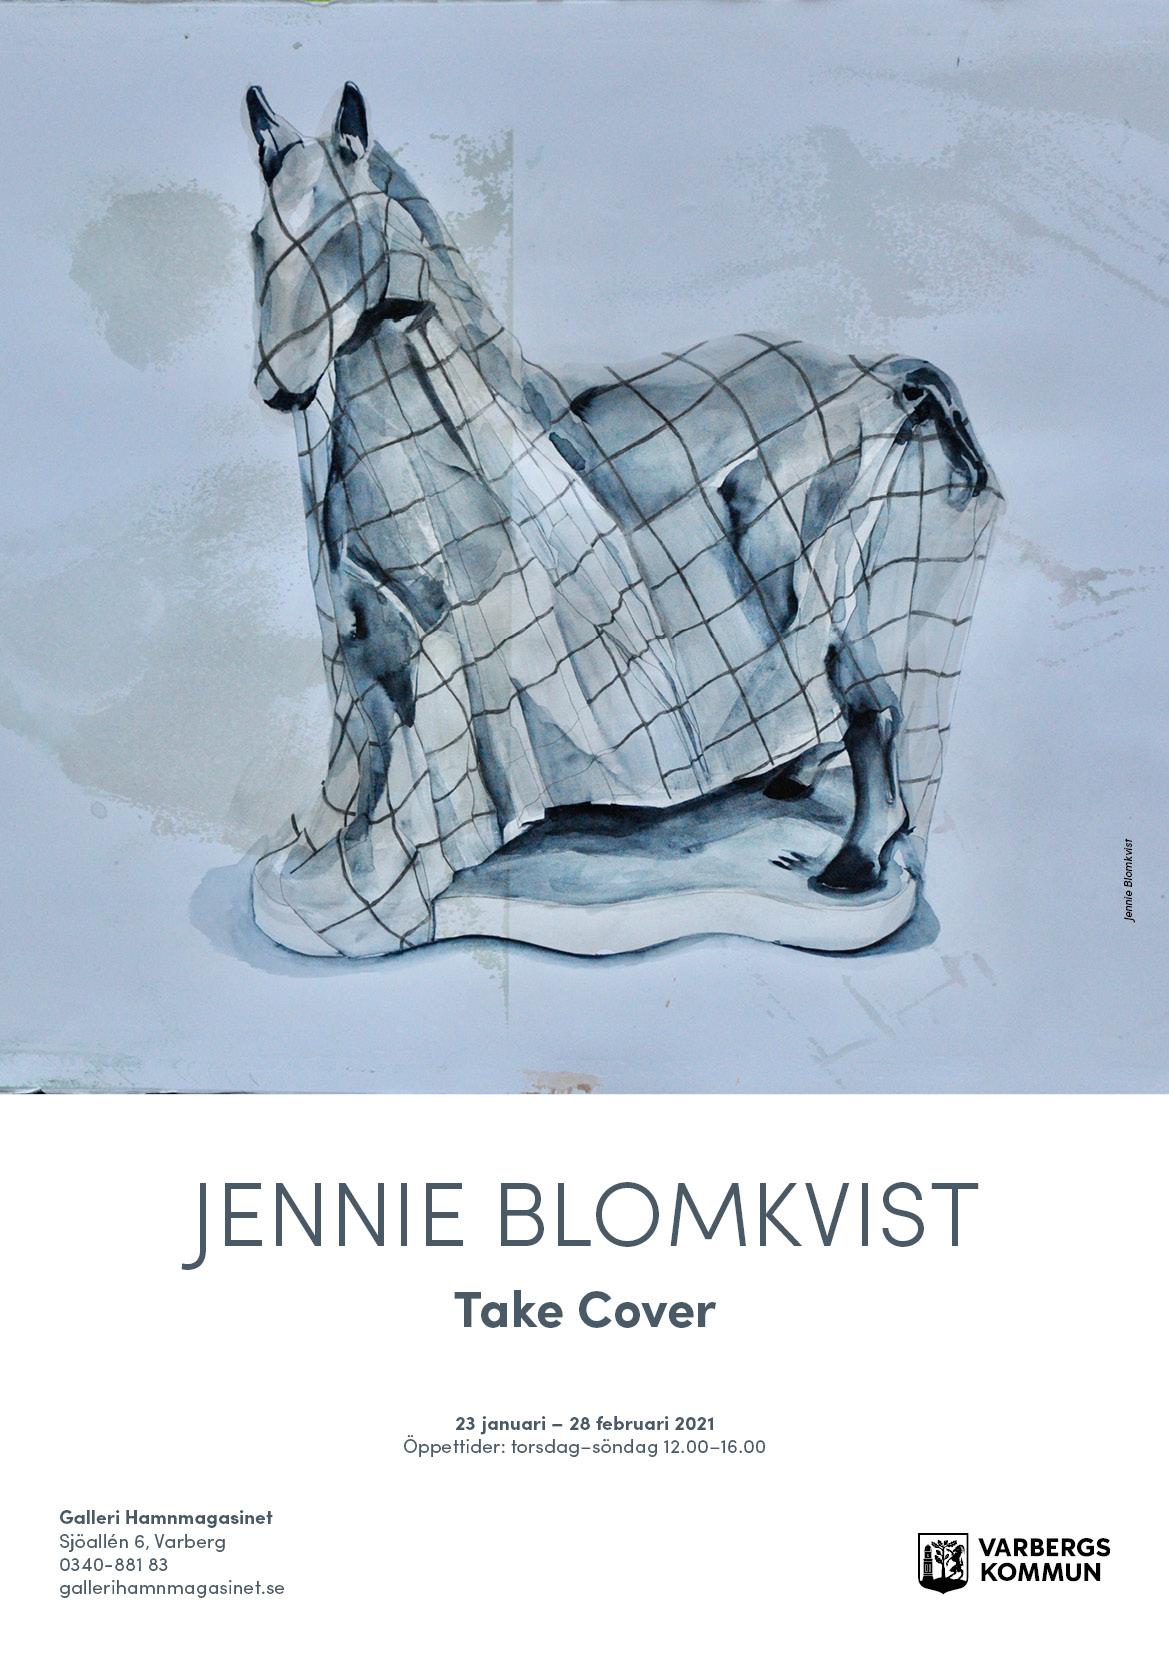 Jennie Blomkvist – 23/1-28/2